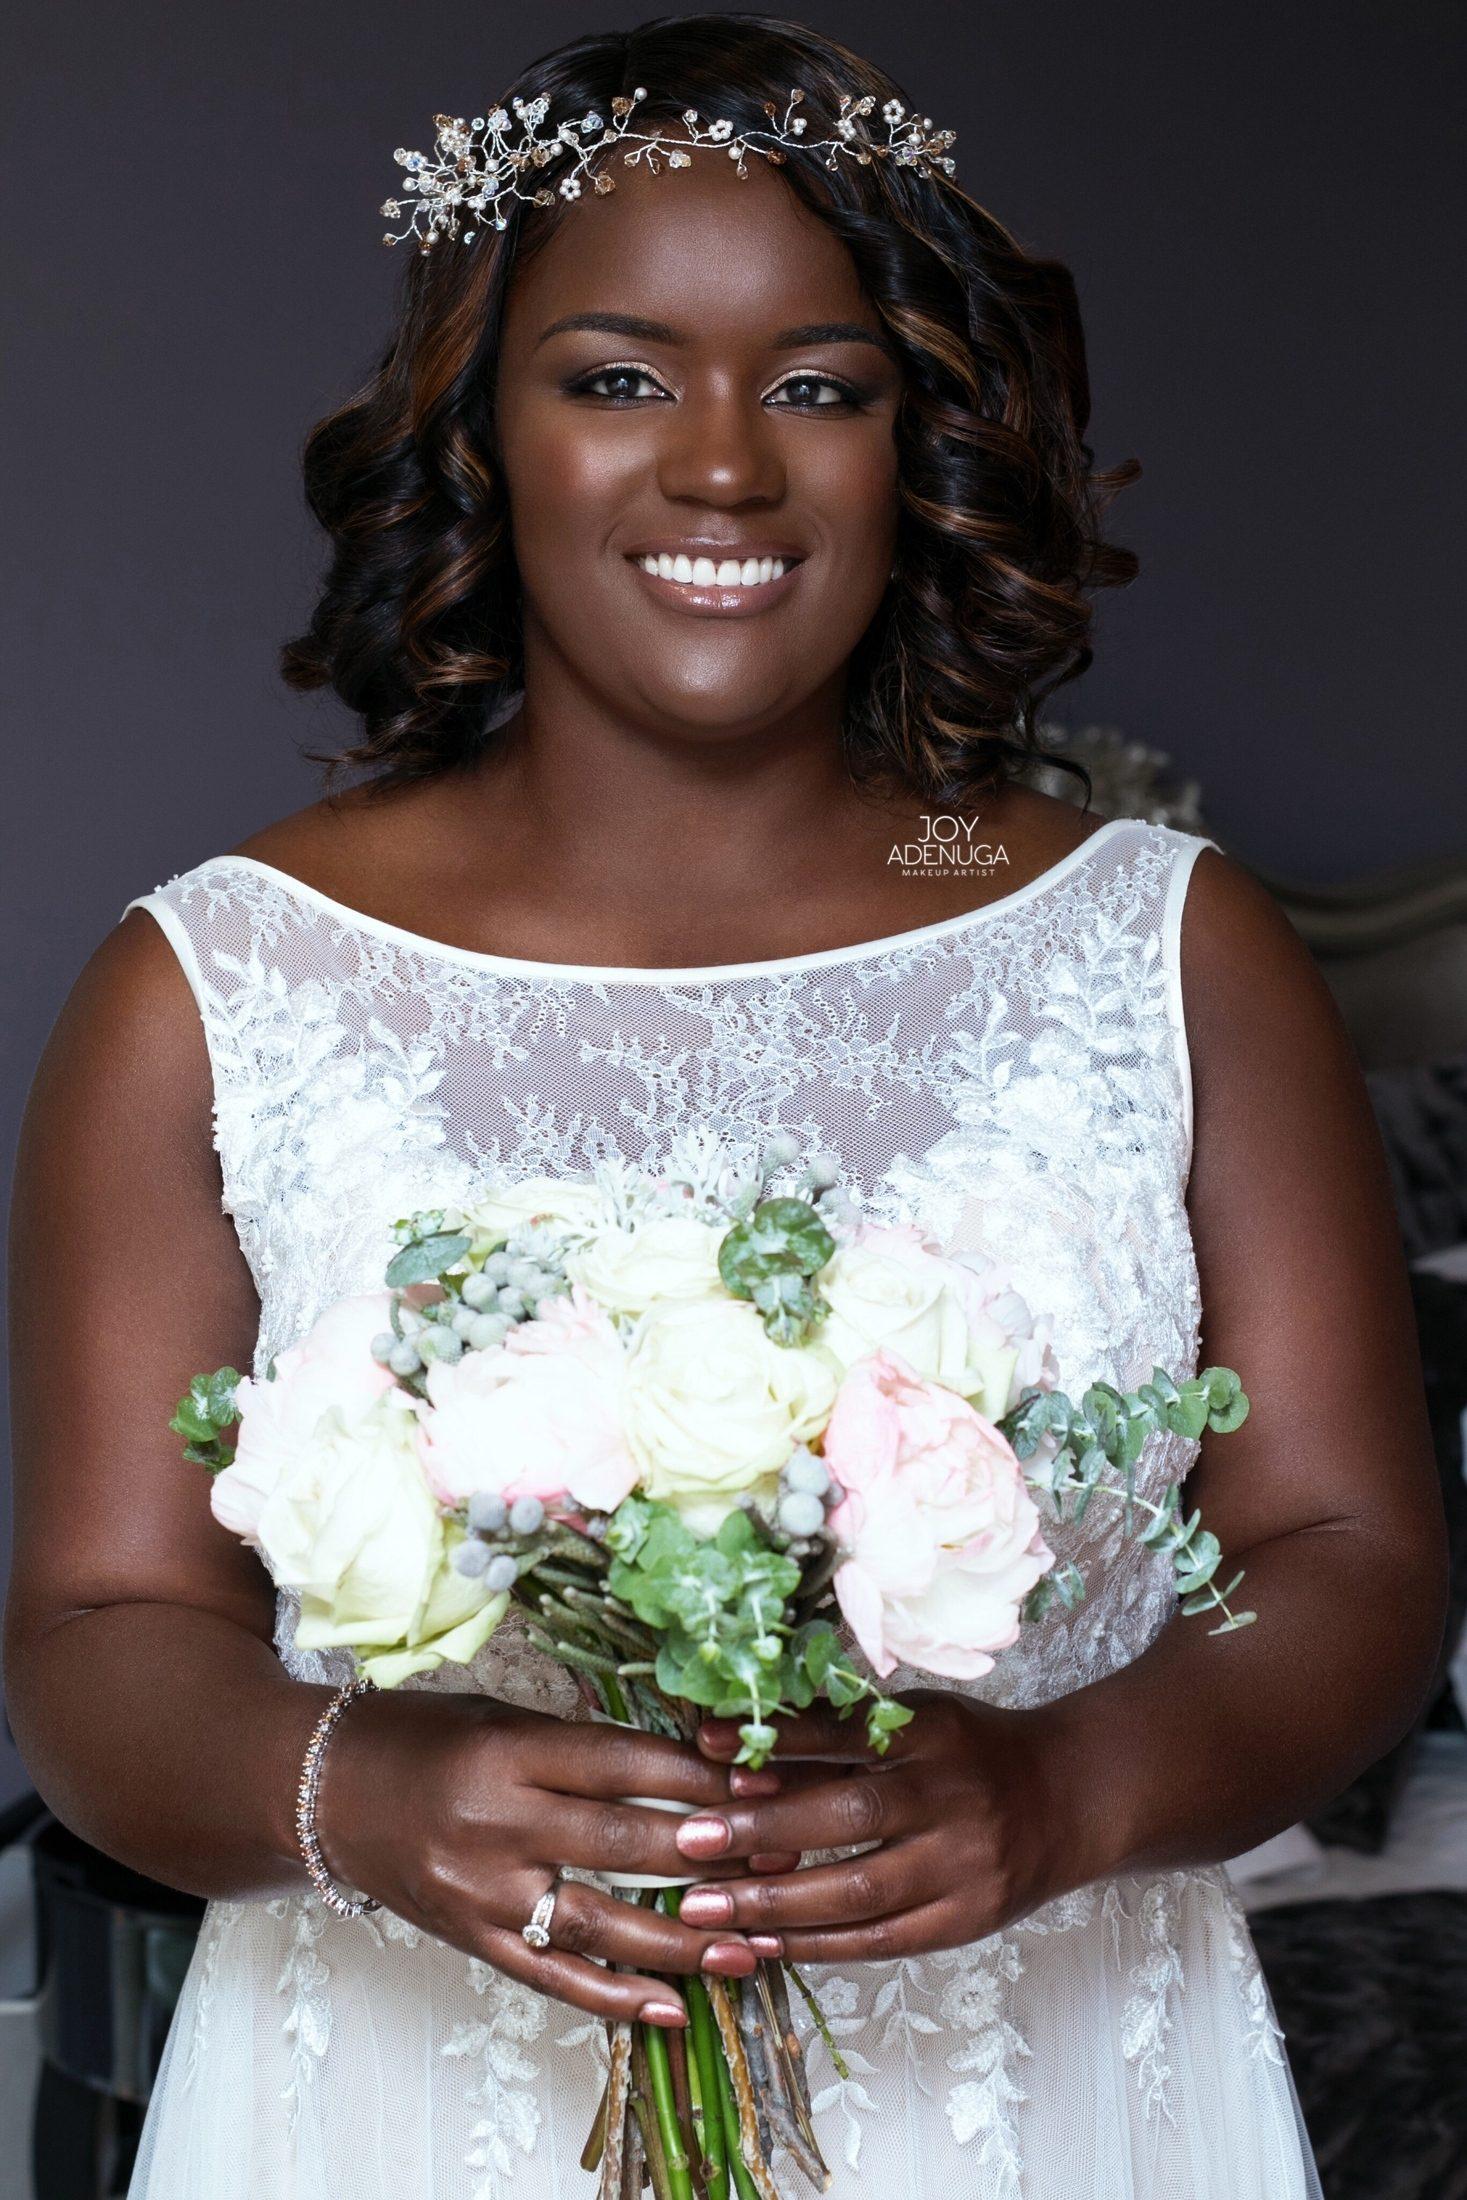 Joy Adenuga Award Winning Black Makeup Artist